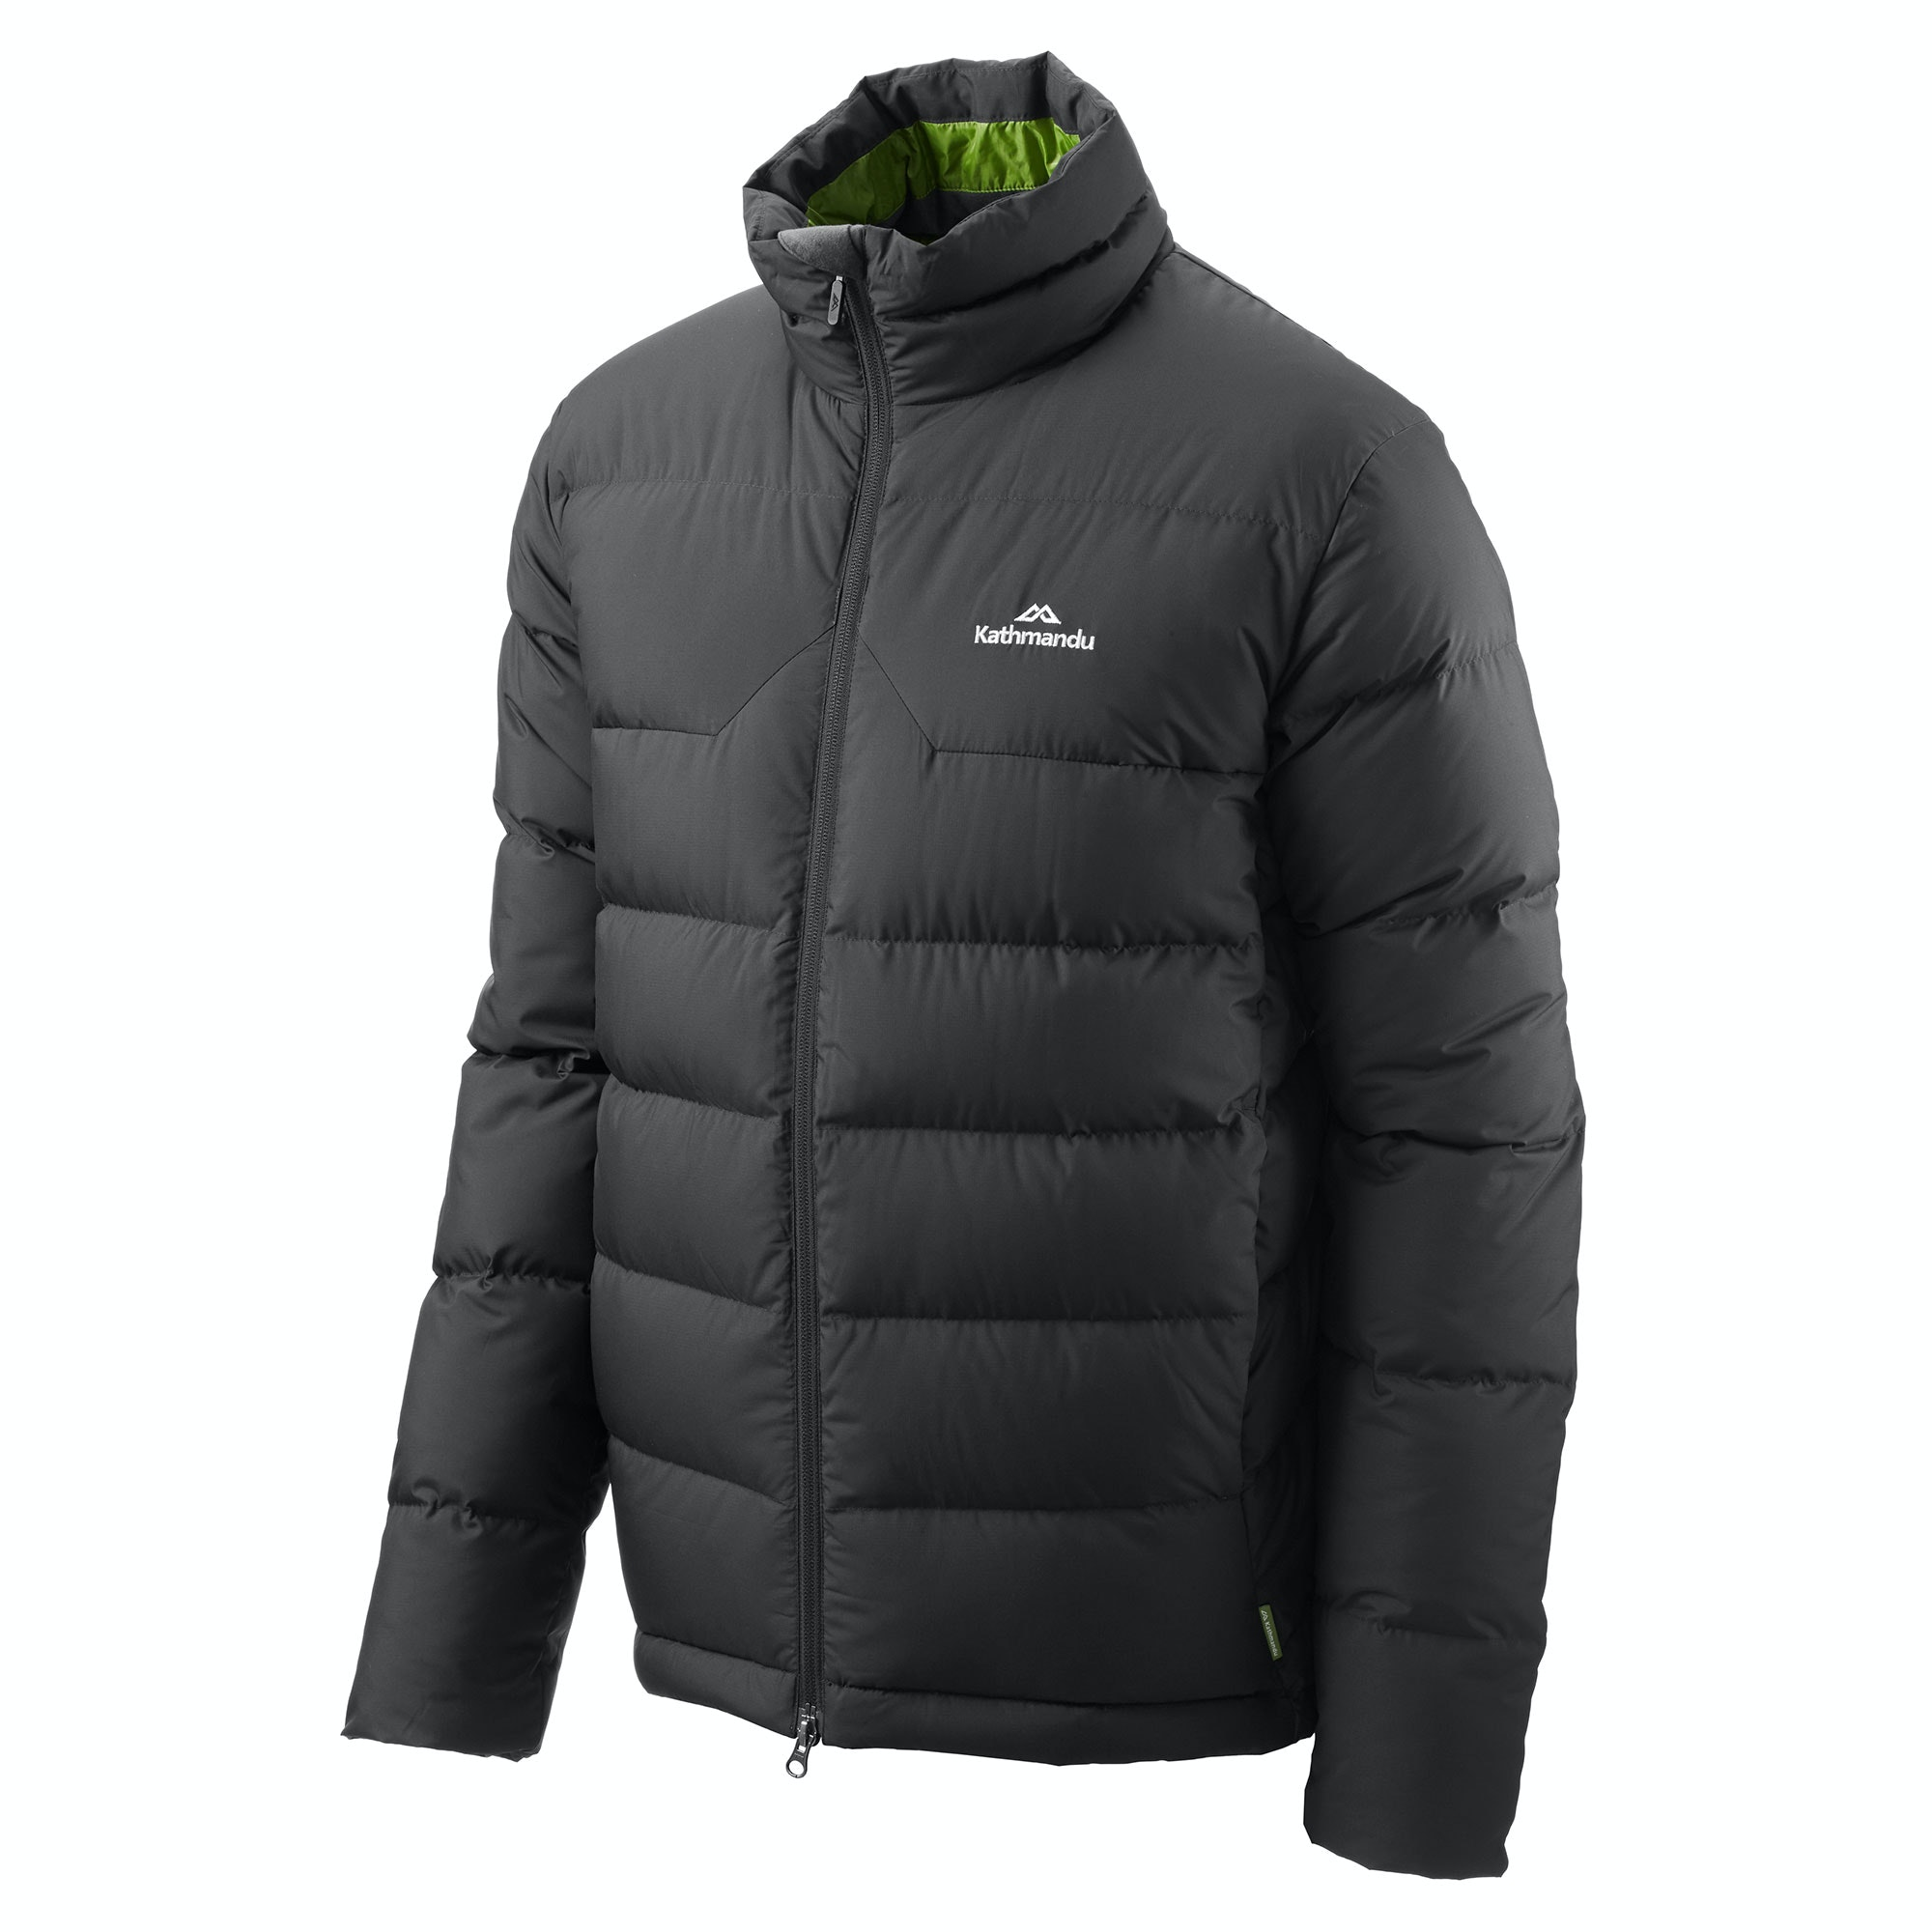 NEW-Kathmandu-Epiq-Men-039-s-Warm-Winter-Duck-Down-Puffer-Jacket-v2 thumbnail 9